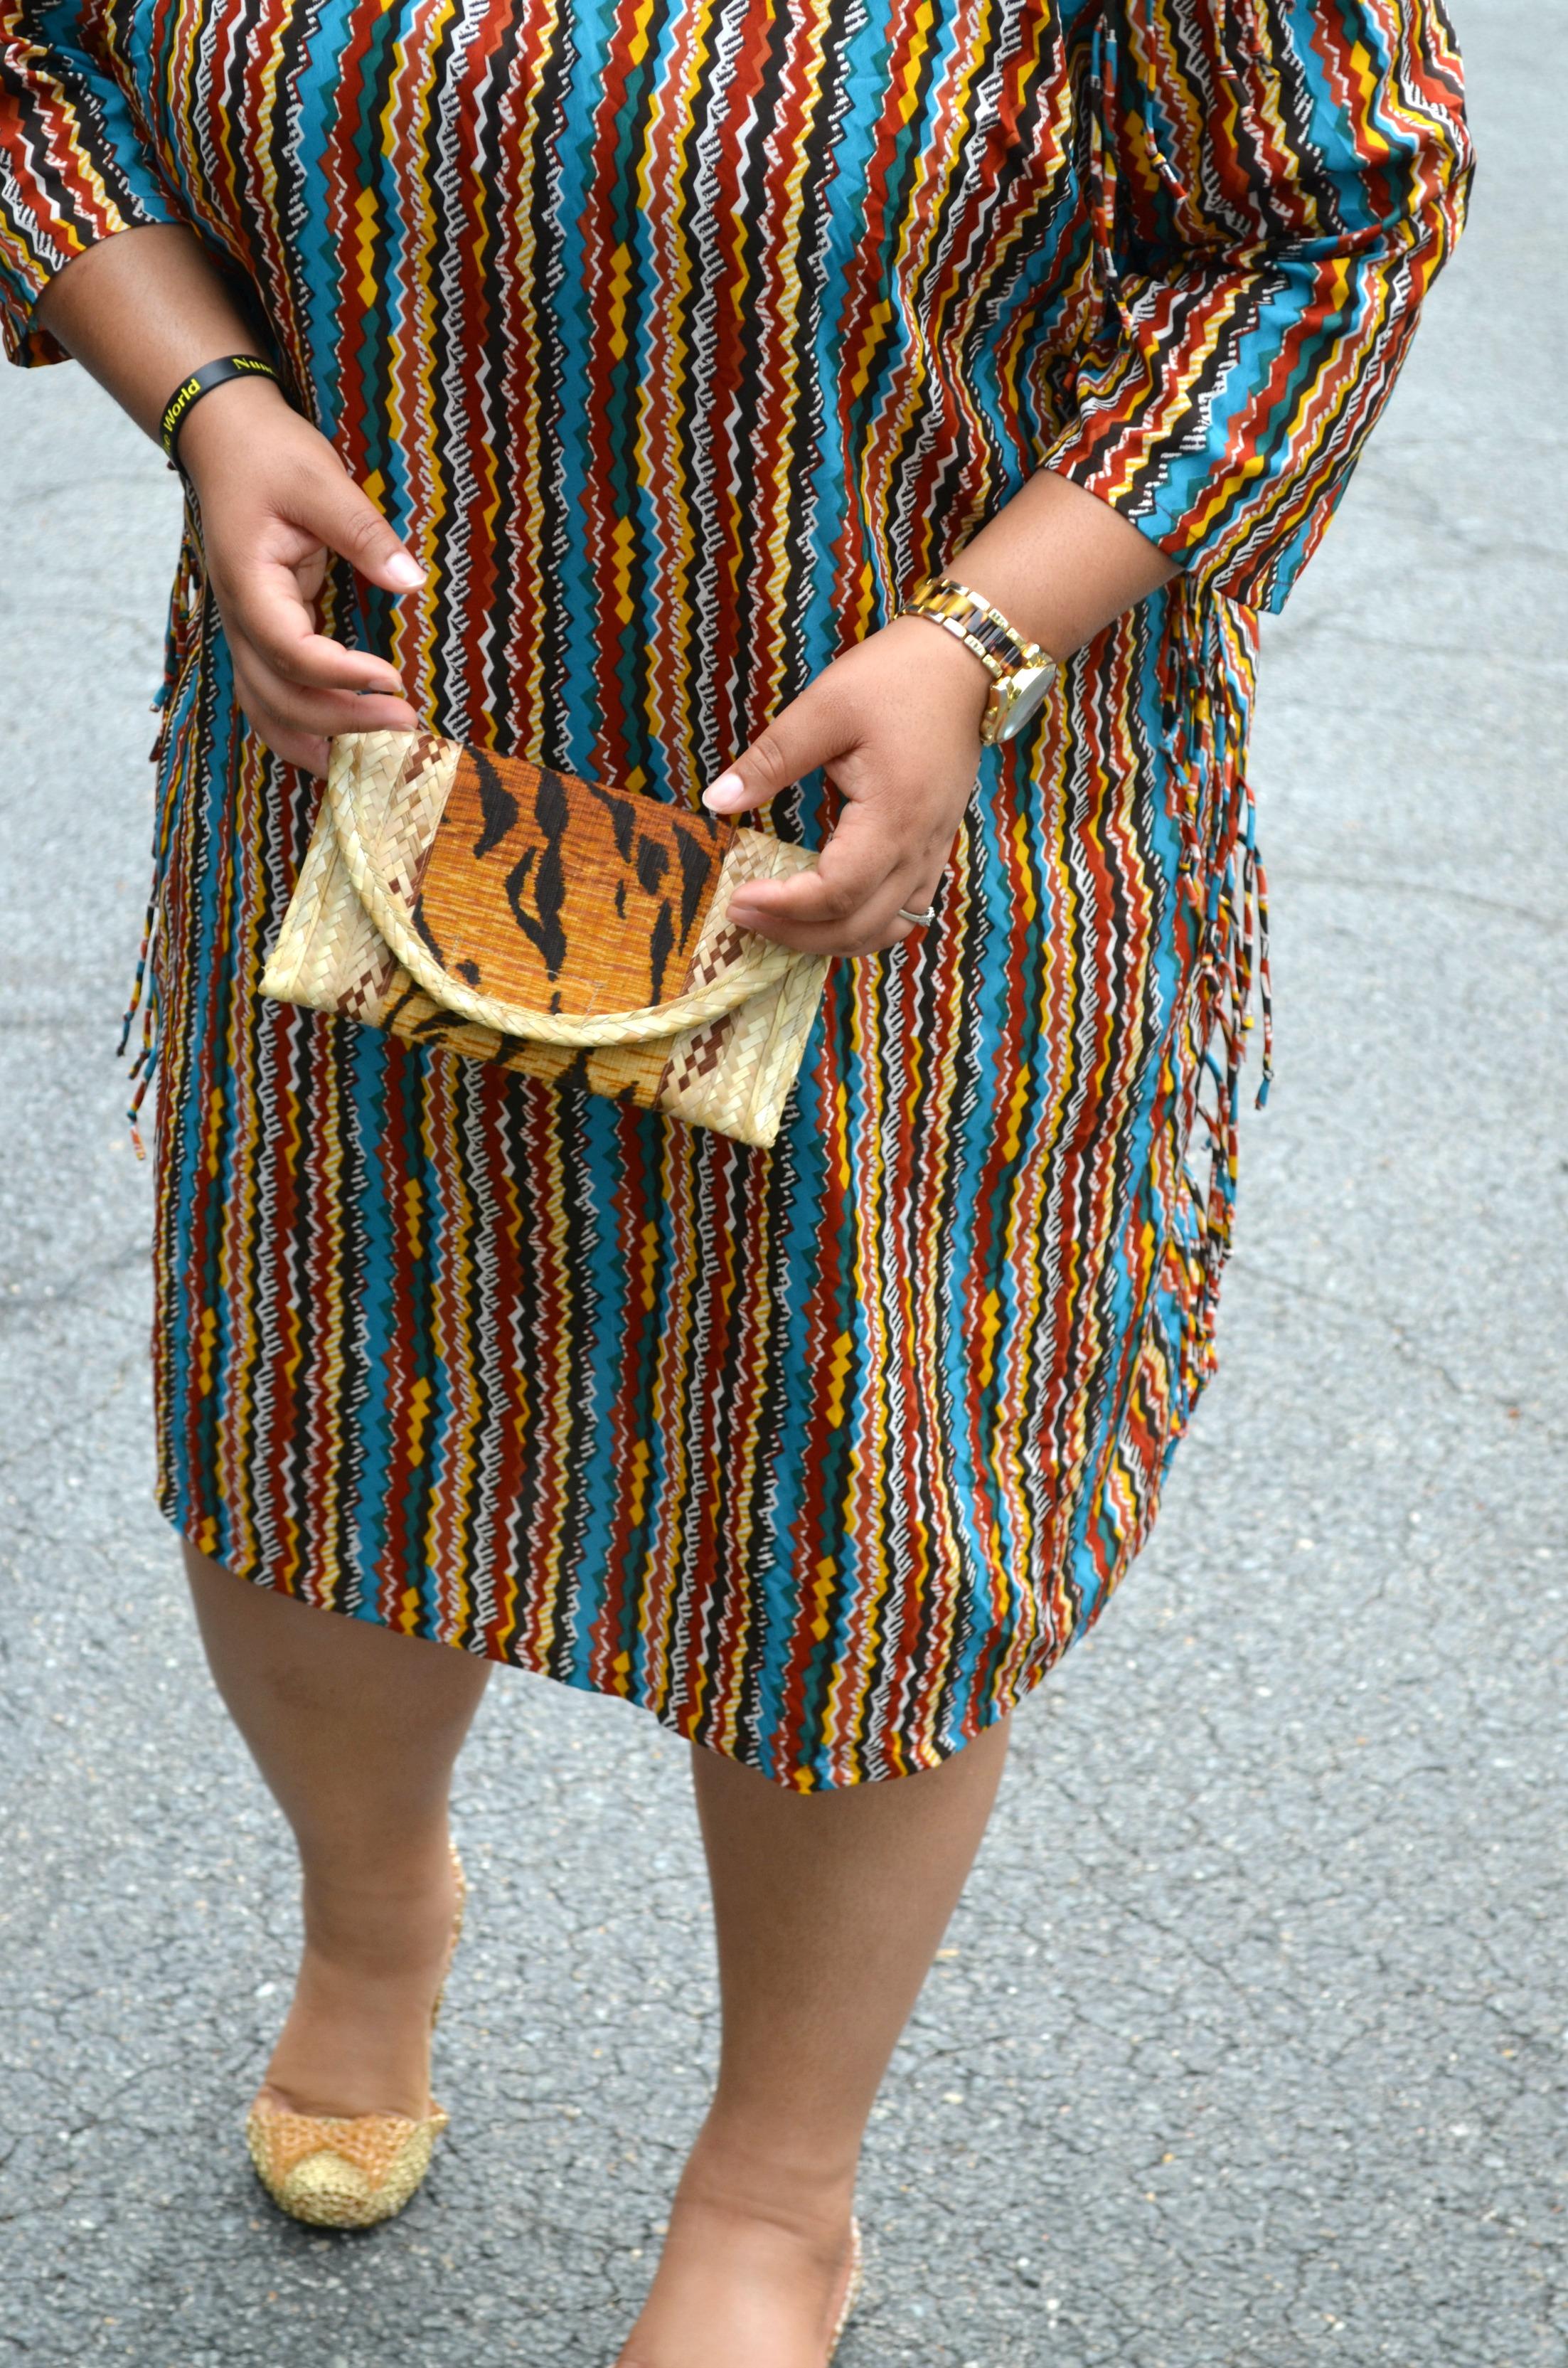 thrifted dress - details